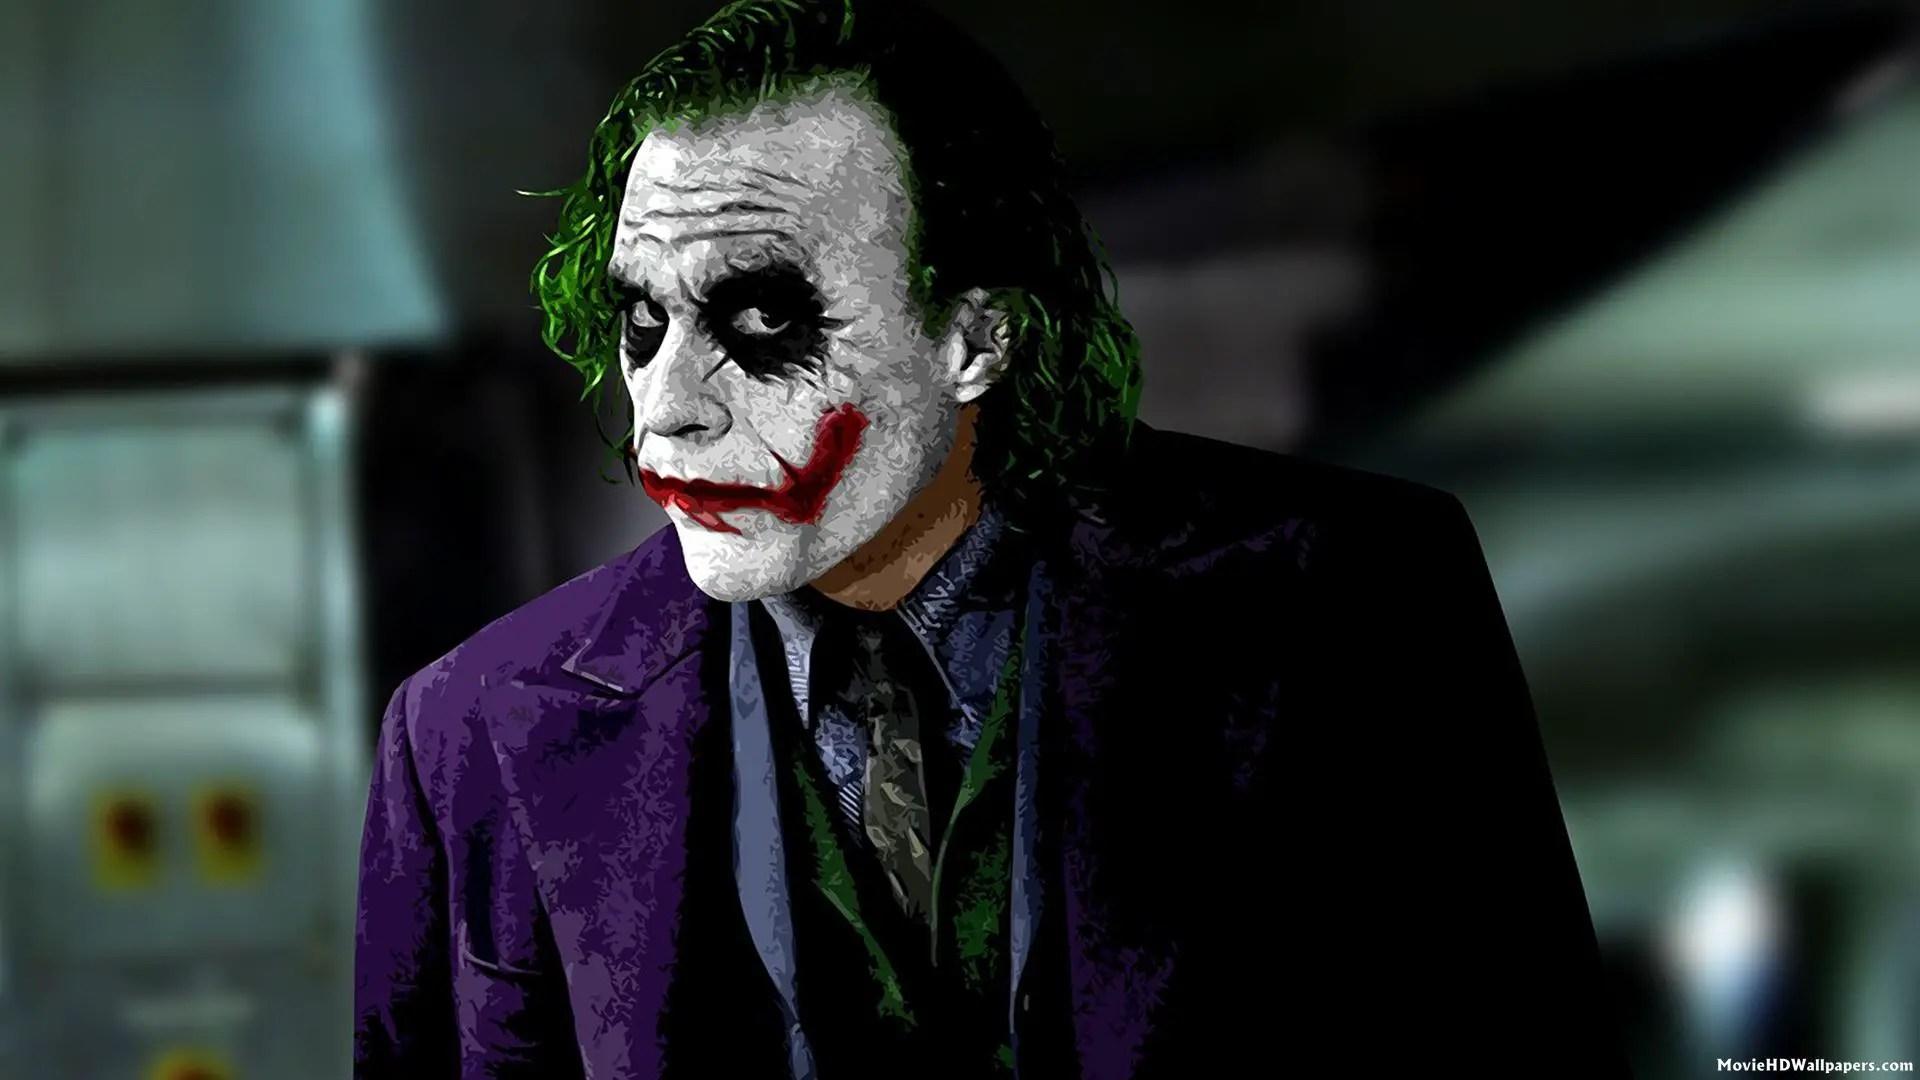 Batman Joker Quotes Mobile Wallpaper Hd Images Of Batman Joker Impremedia Net